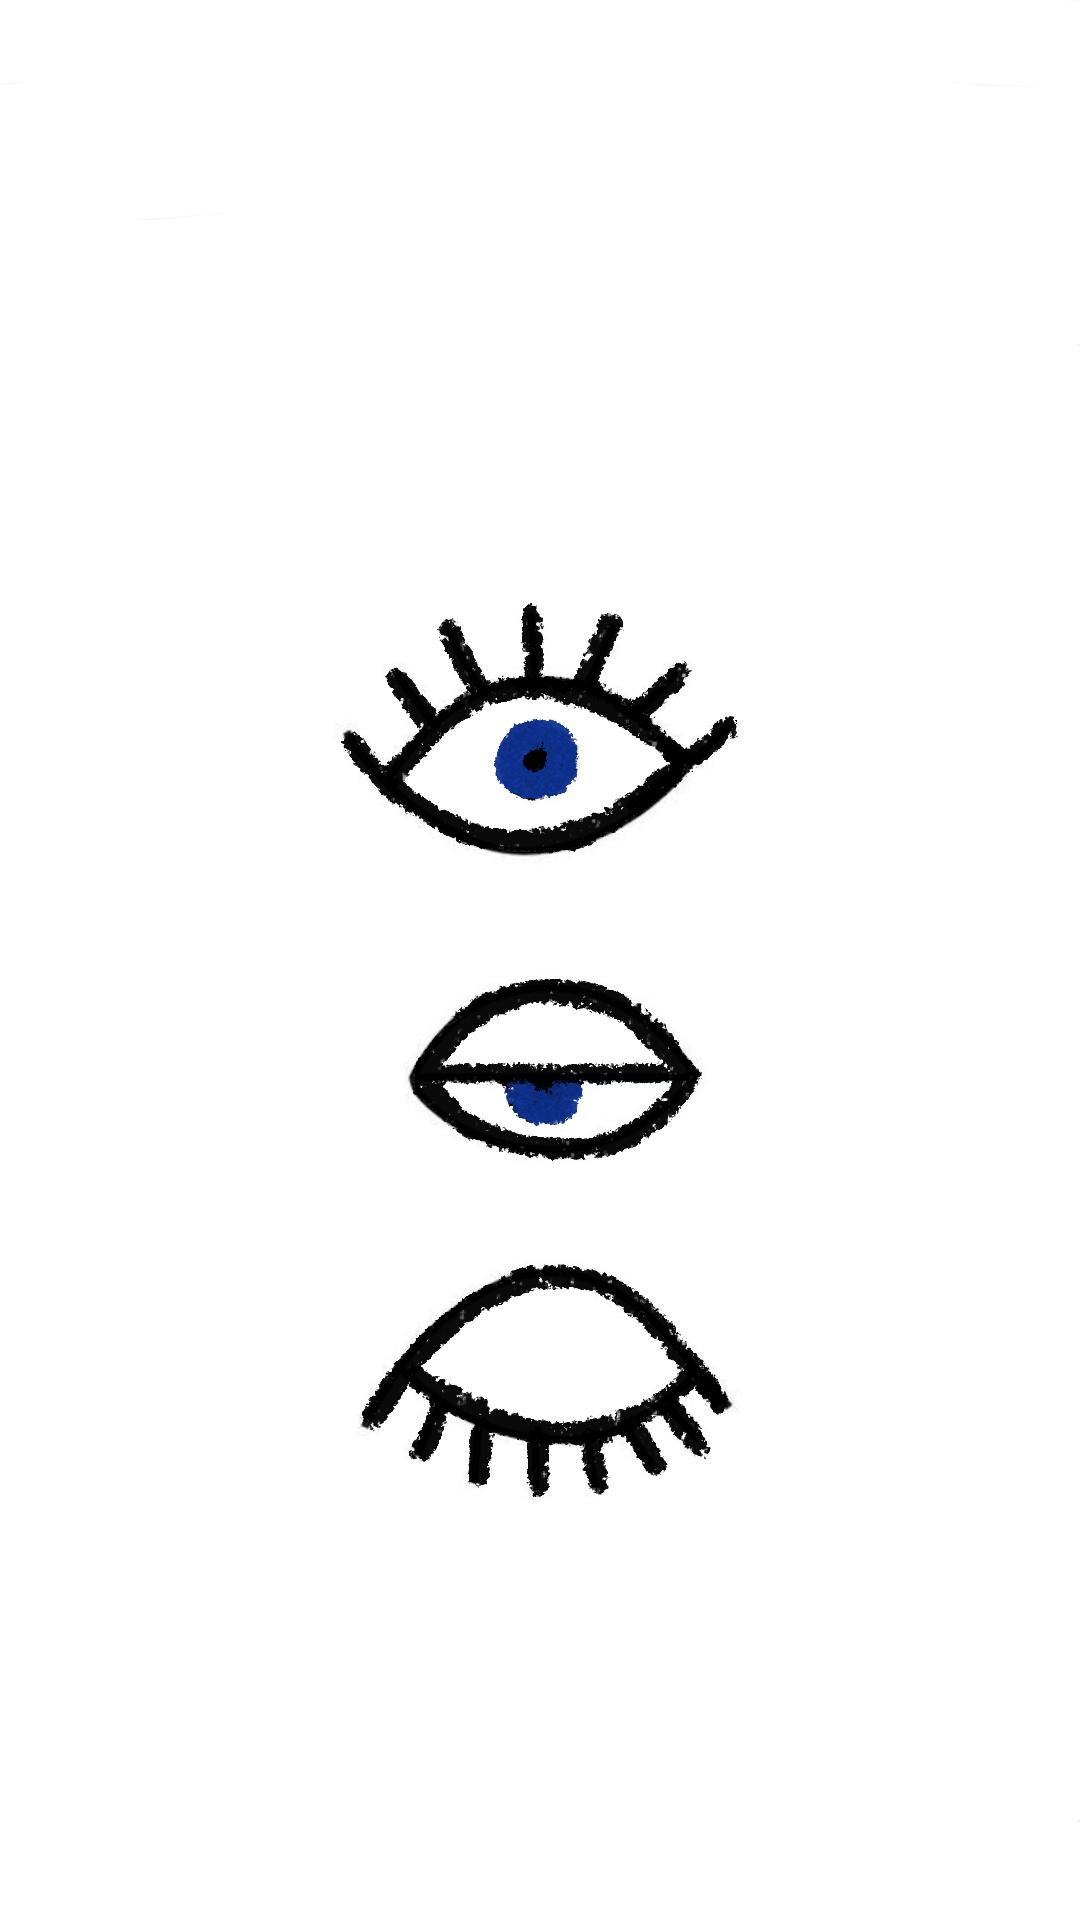 Evil Eyes In 2021 Greek Evil Eye Tattoo Eye Drawing Simple Evil Eye Design